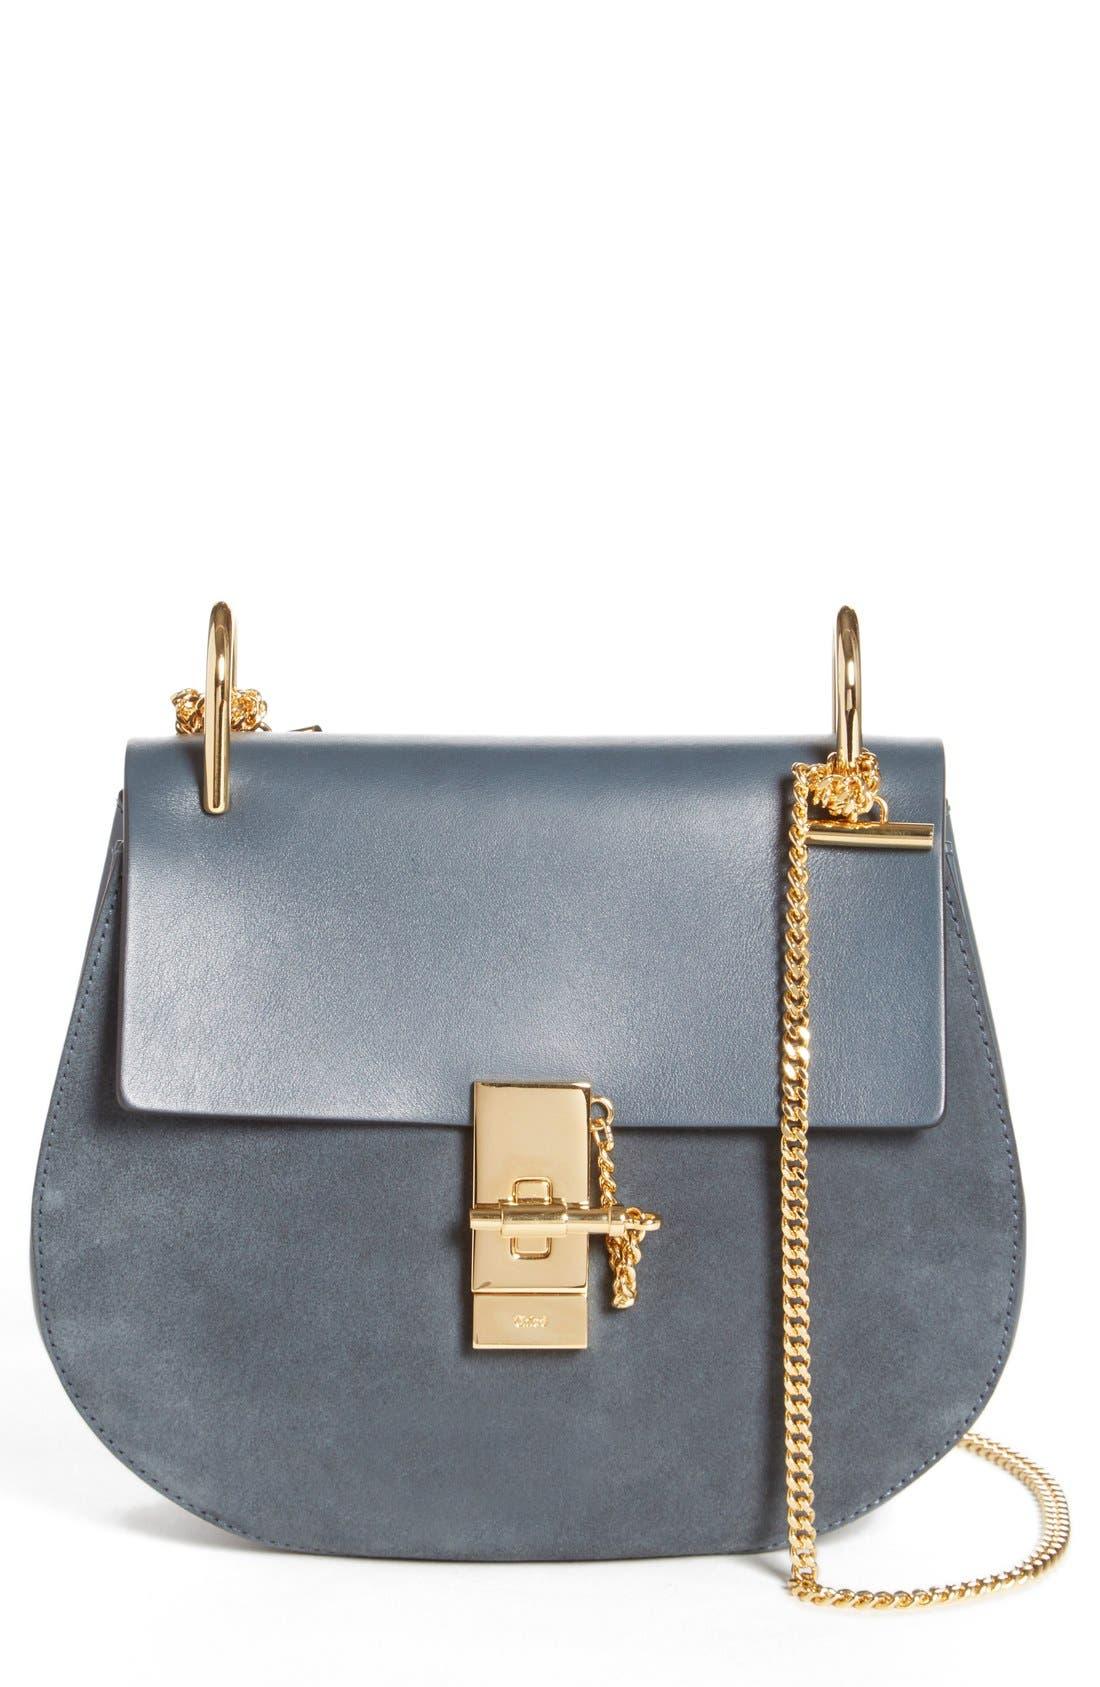 Main Image - Chloé Drew Leather & Suede Shoulder Bag